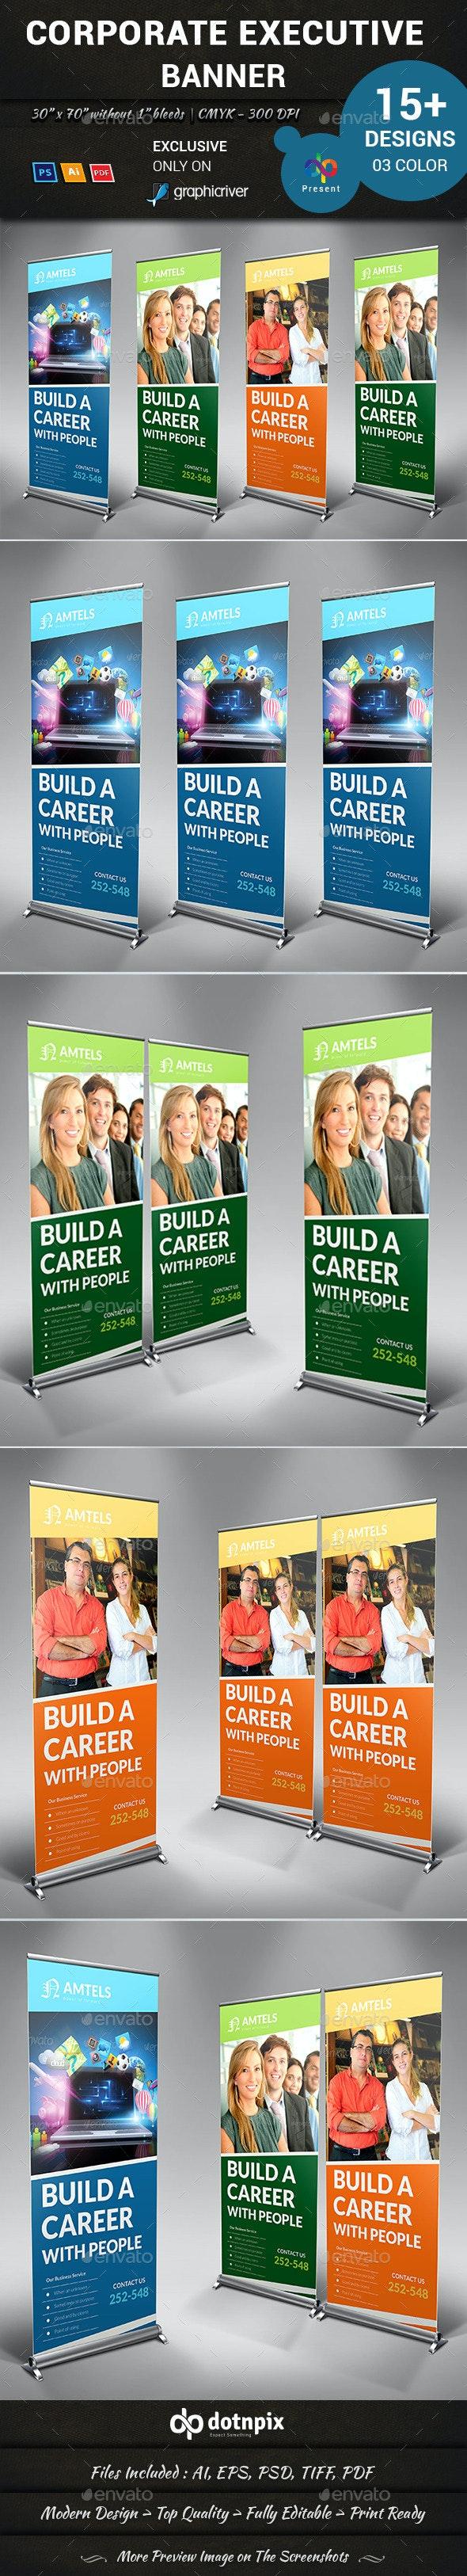 Corporate Executive Banner - Signage Print Templates